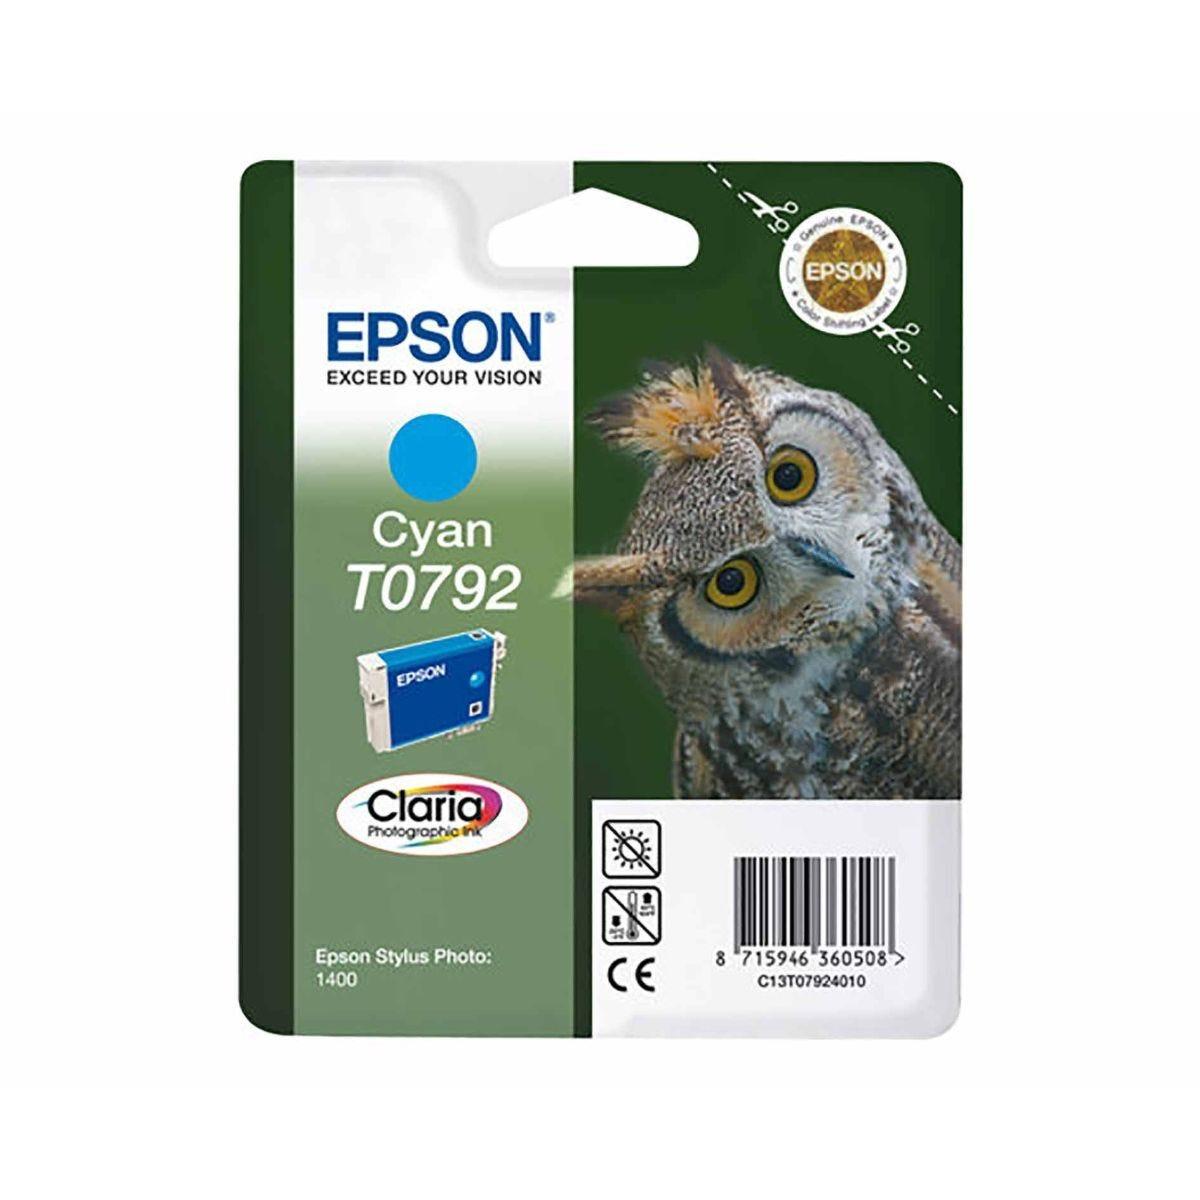 Epson T0792 Ink Cartridge